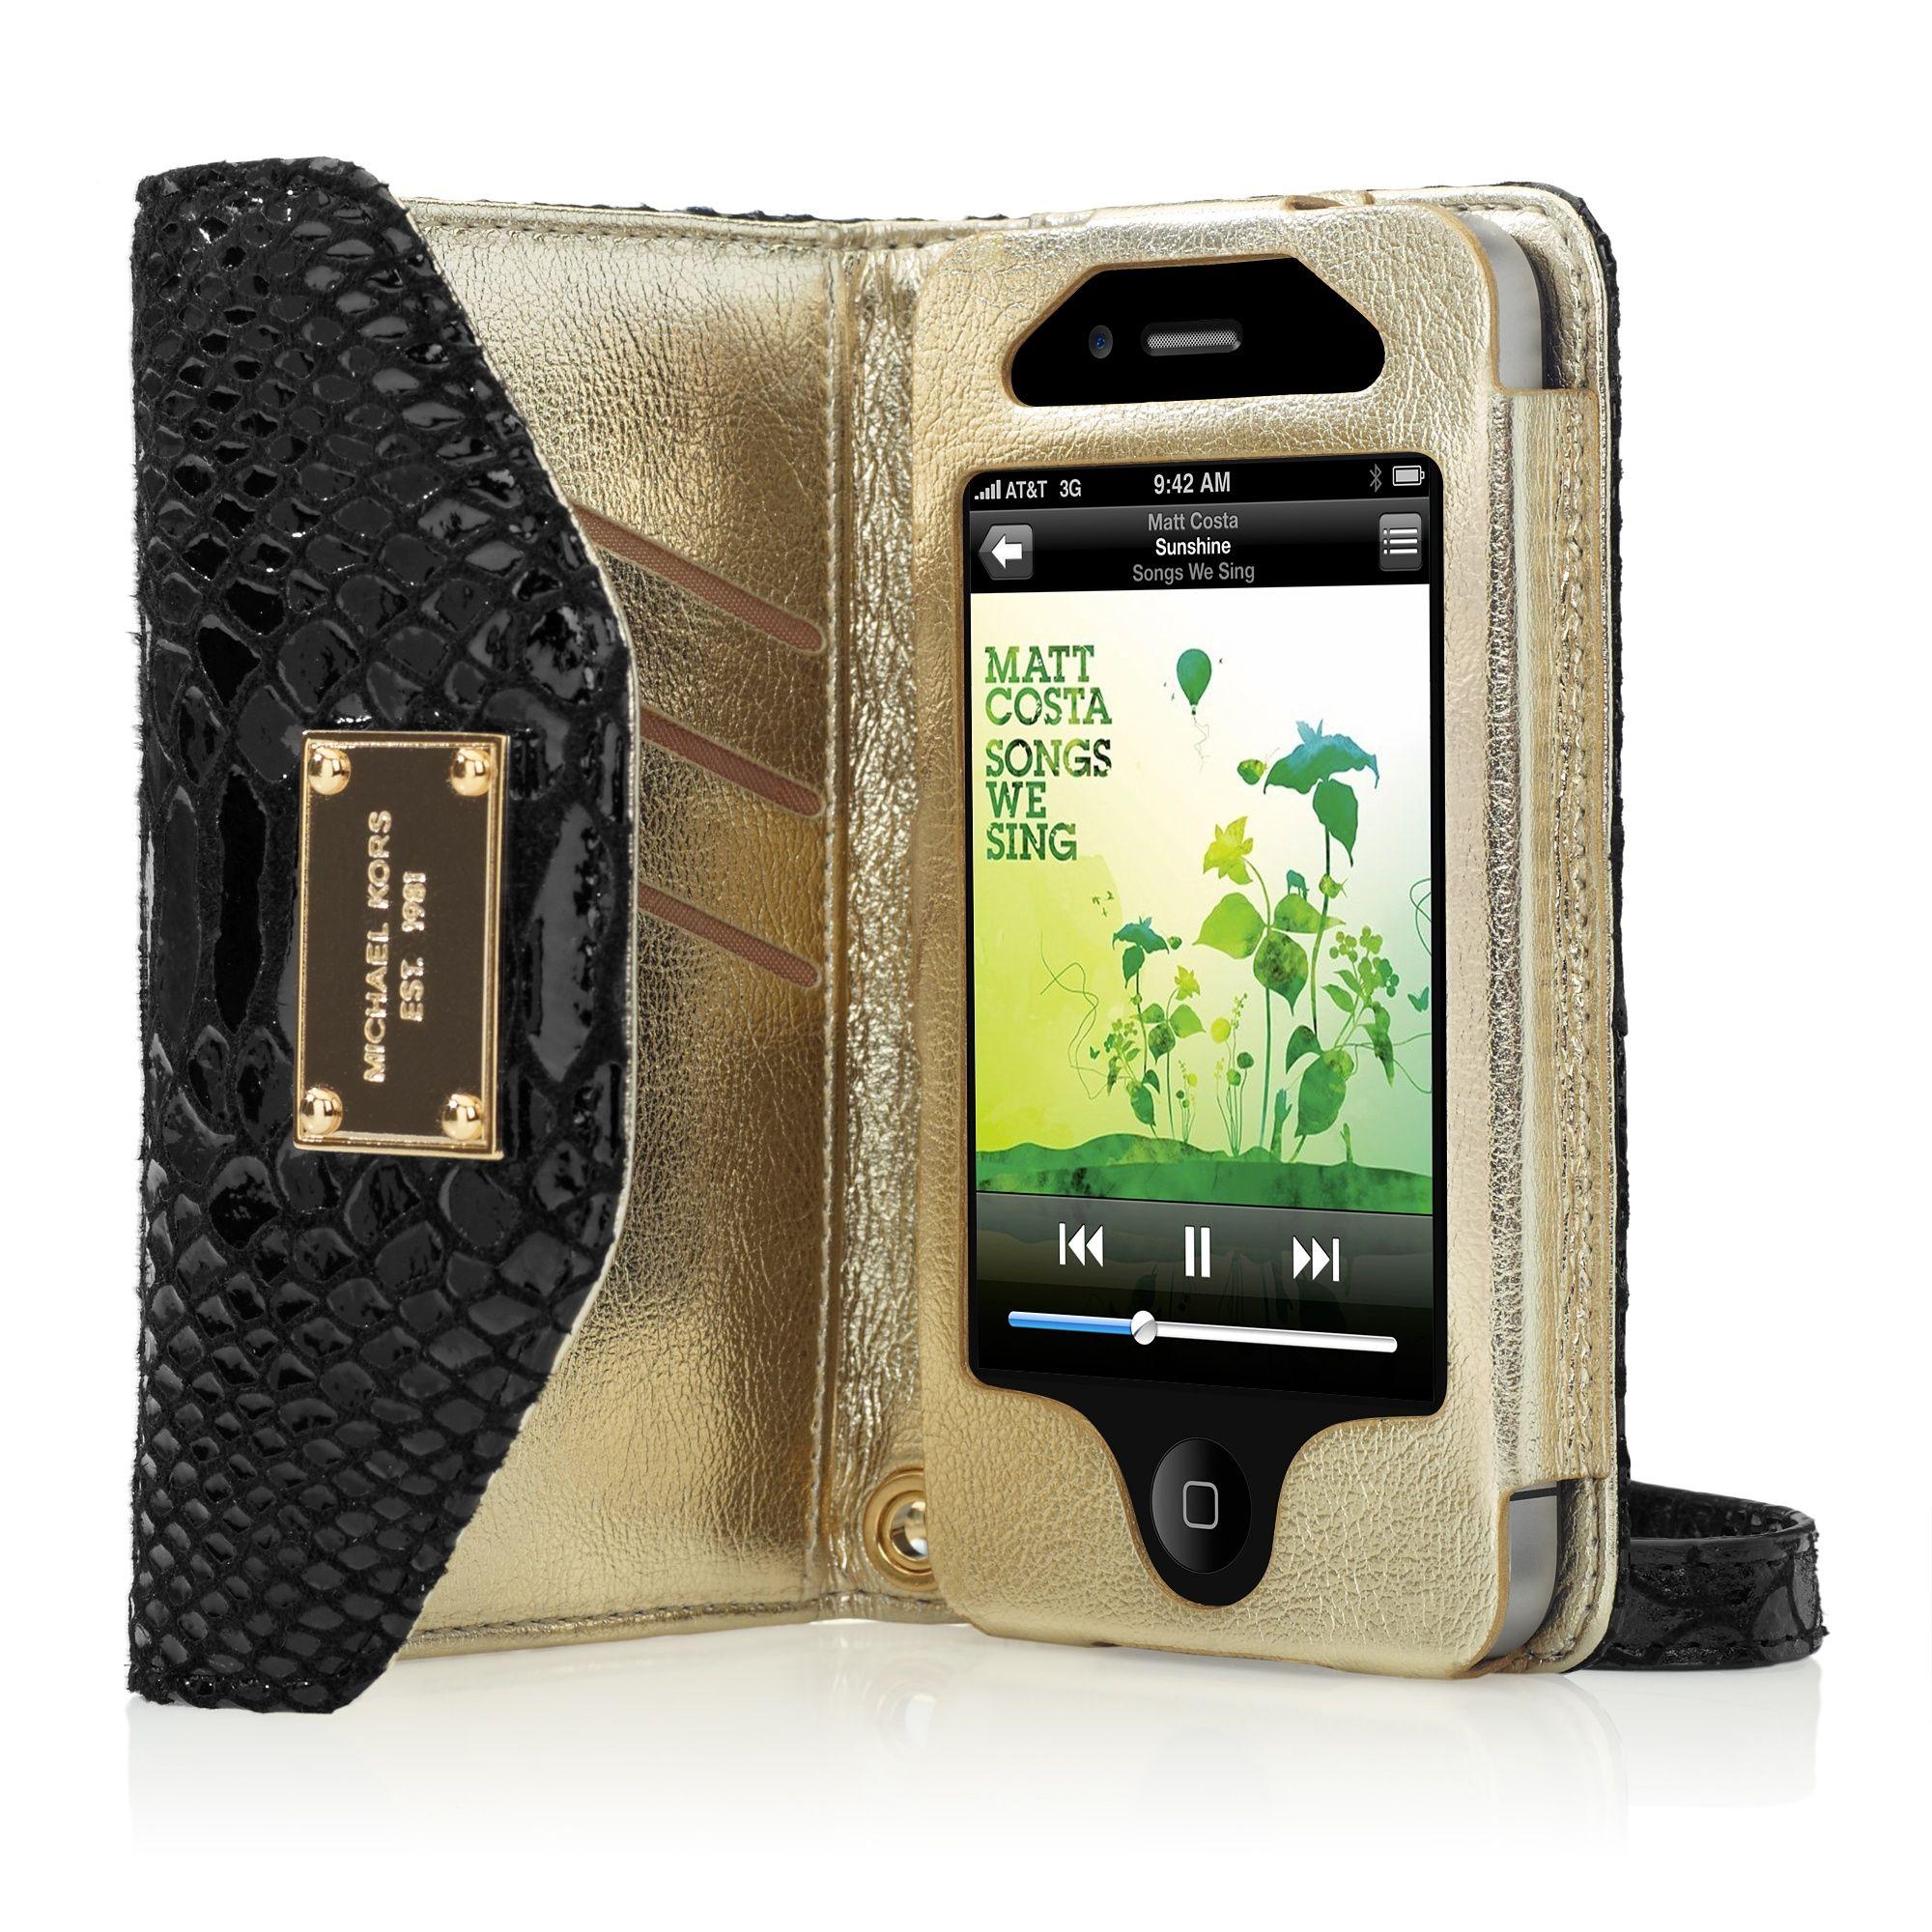 04367f353c3d Michael Kors iPhone wallet clutch! | Wish List | Michael kors wallet ...